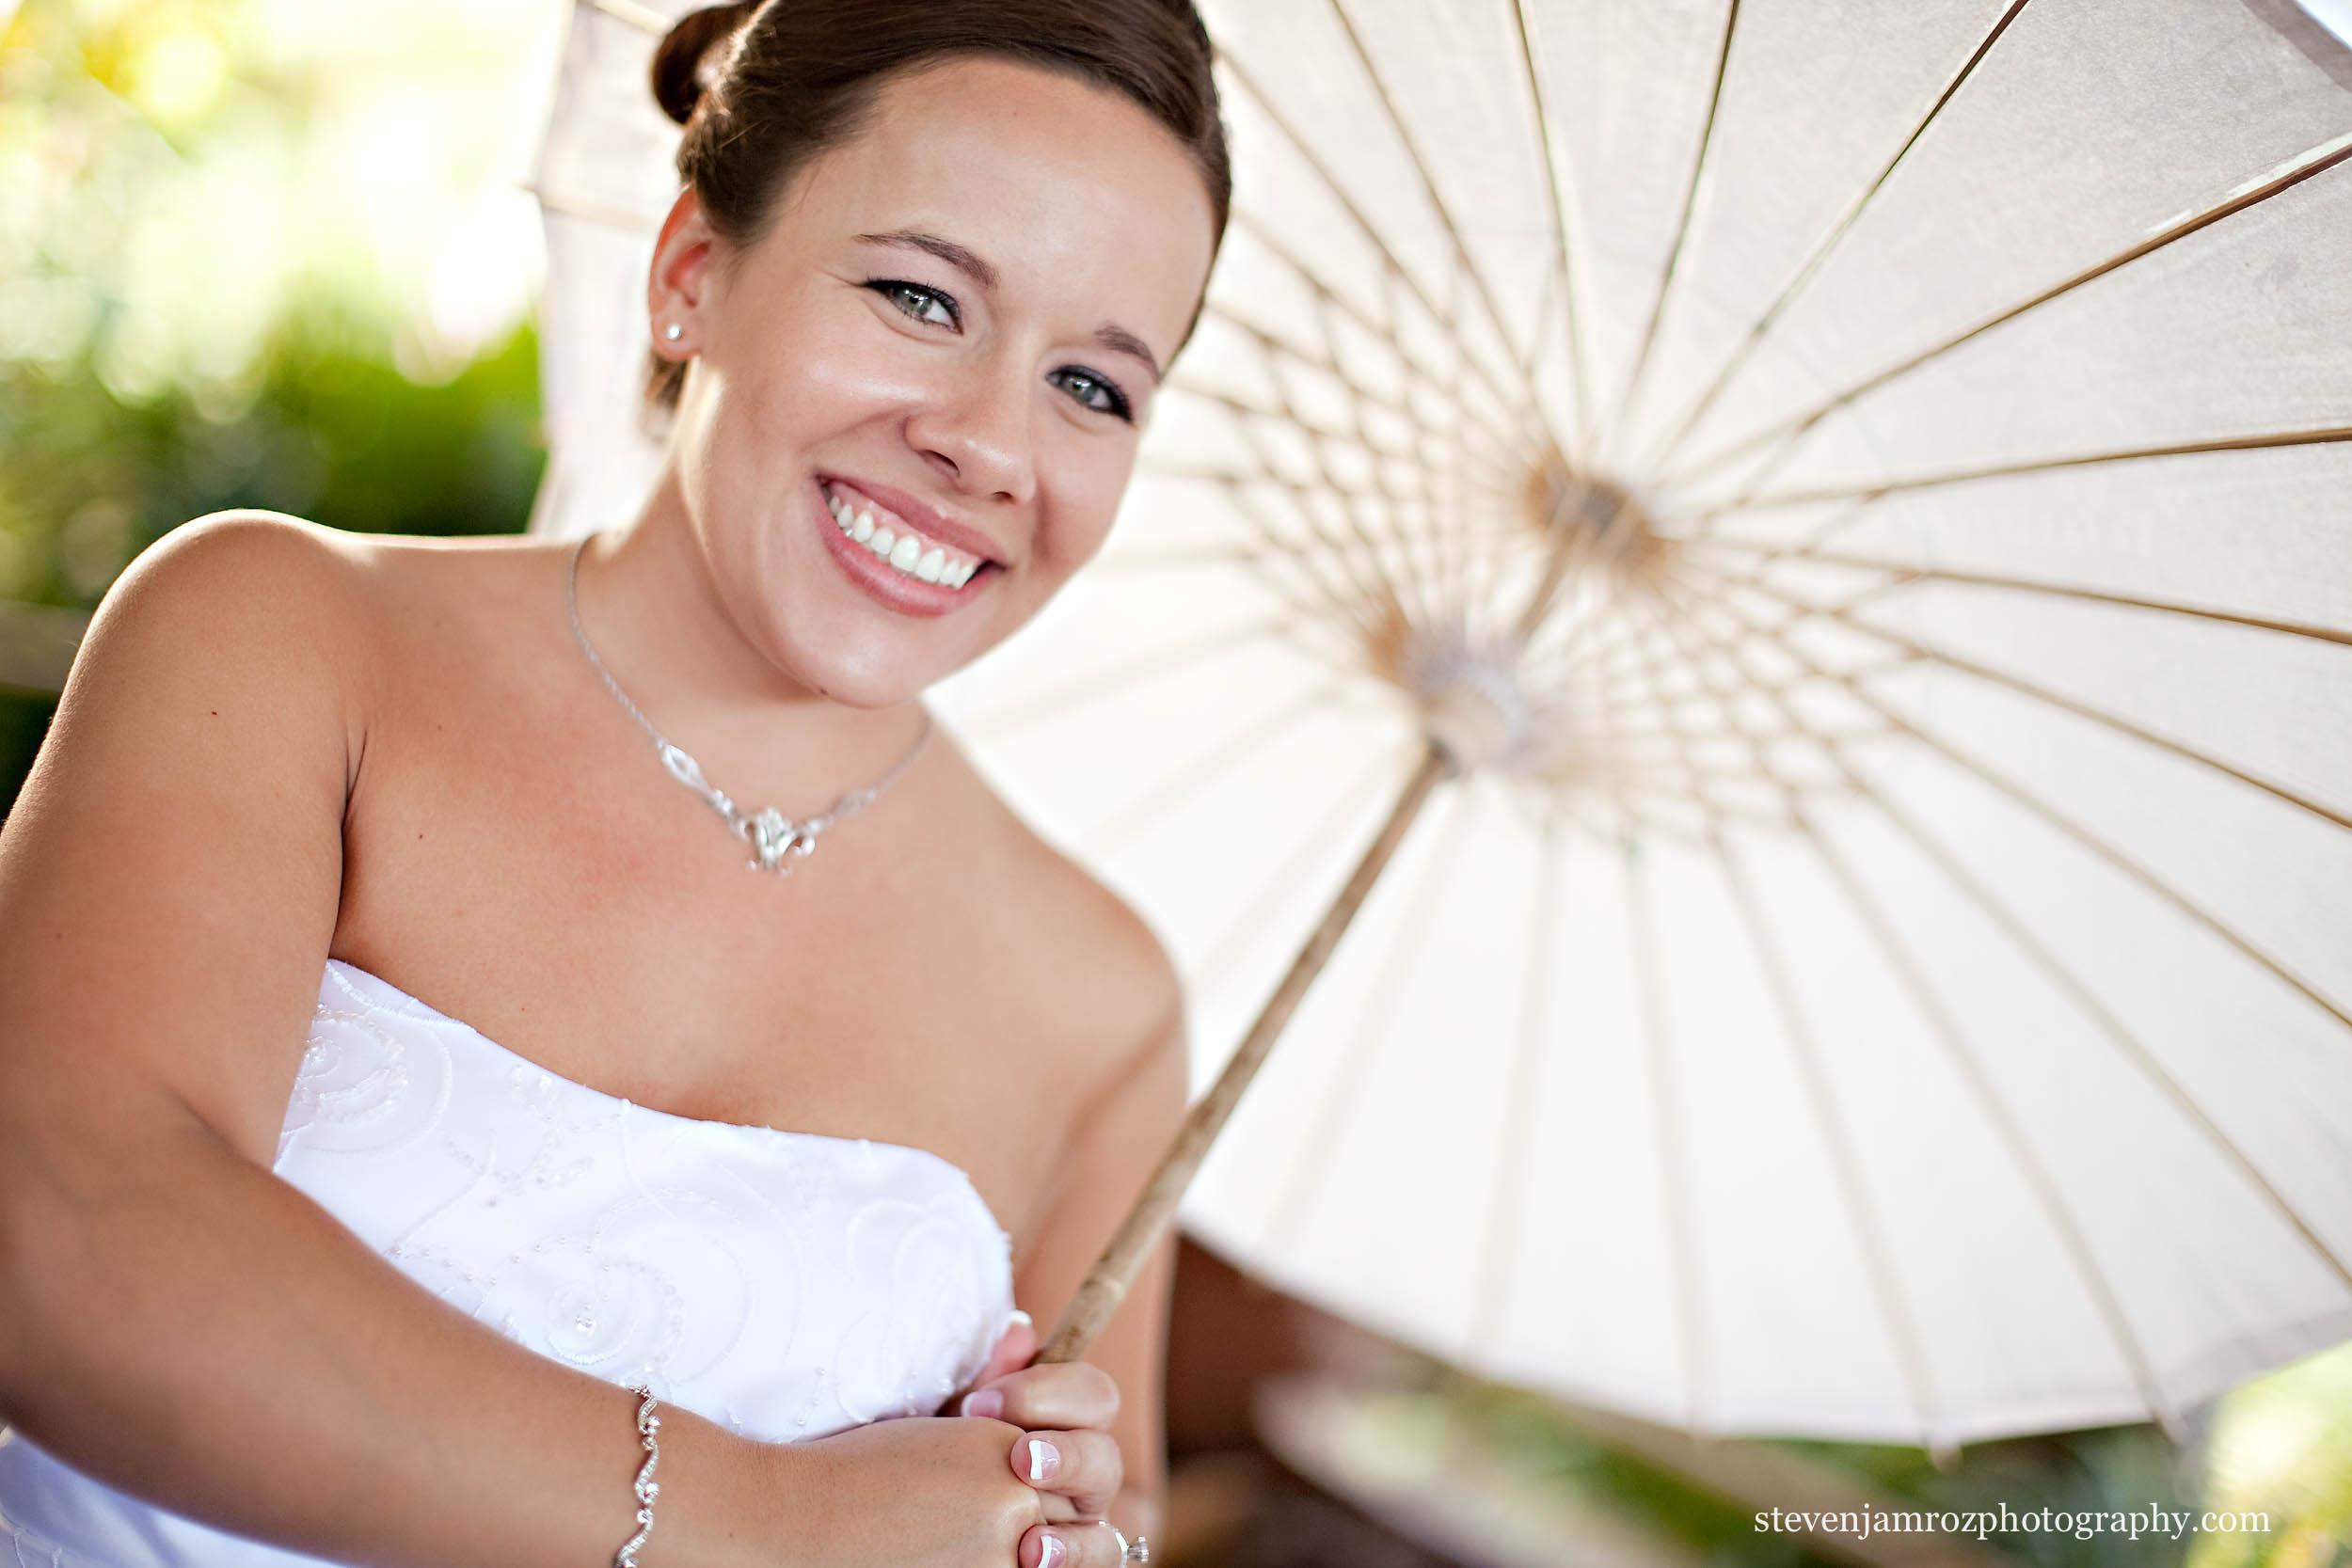 parasol-bride-wedding-photography-steven-jamroz-0723.jpg